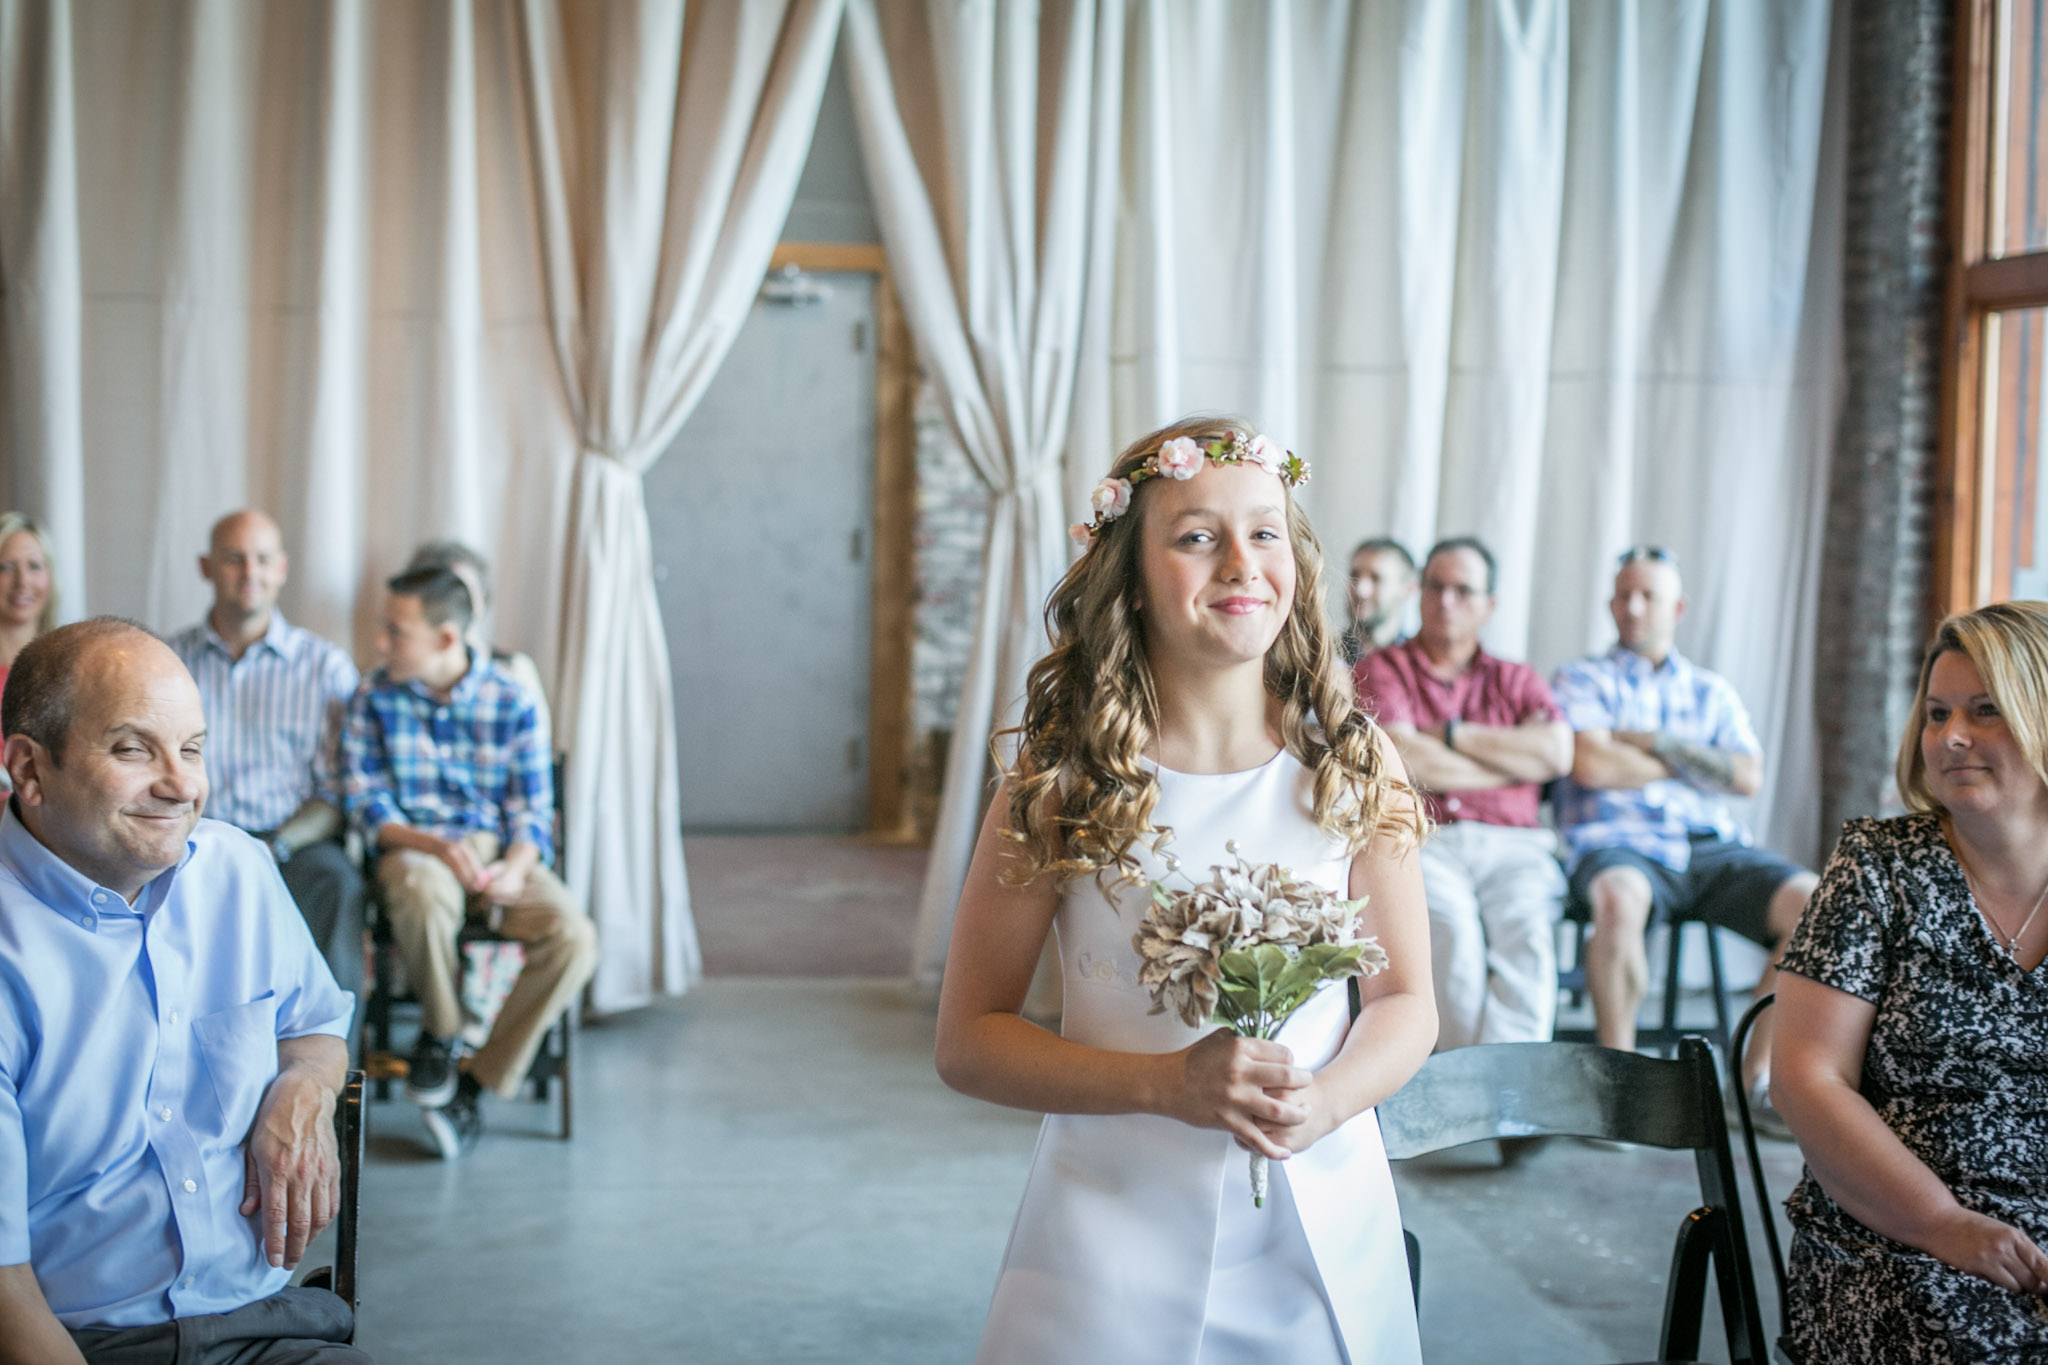 Kansas_City_Small_Wedding_Venue_Elope_Intimate_Ceremony_Budget_Affordable_Sophie&Philip_080.jpg